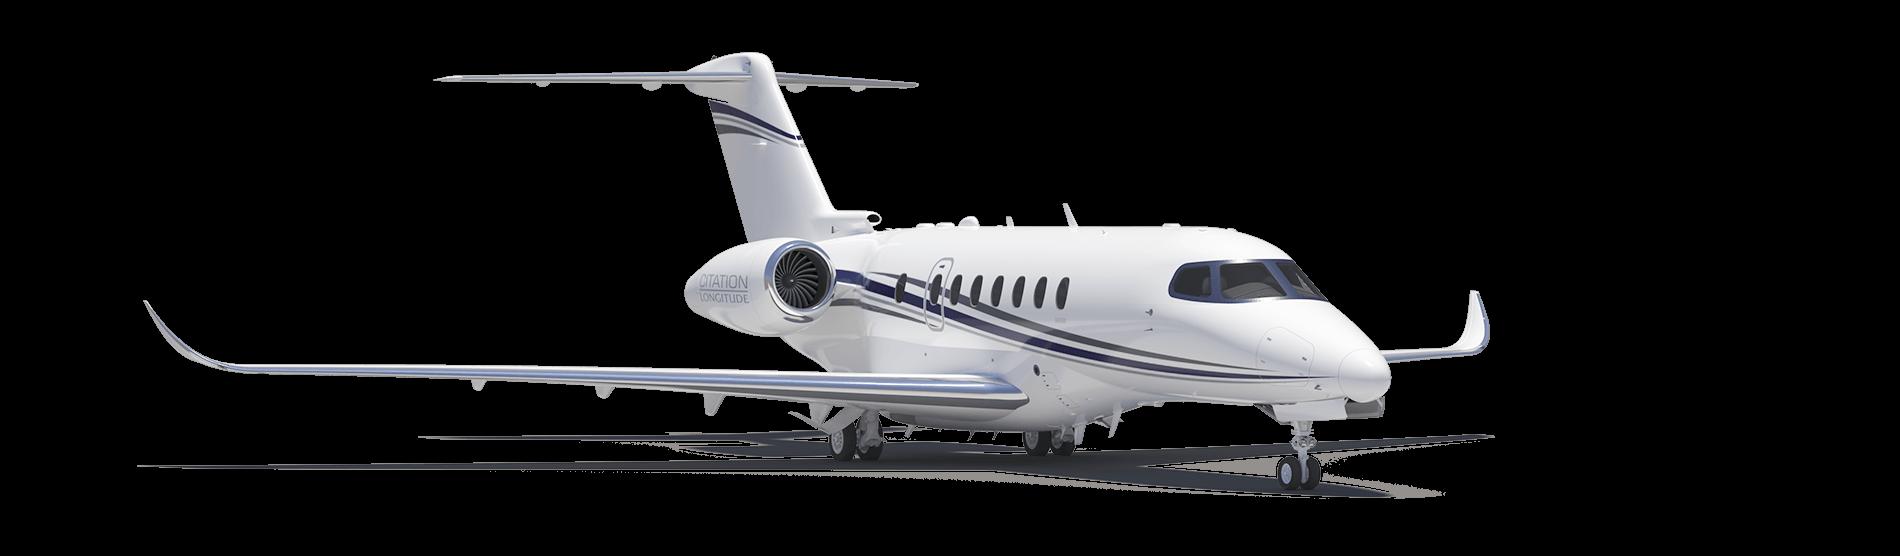 Cessna private jet charter Cessna business jet Cessna corporate jet Cessna charter11 - Cessna private jet builder Cessna private charter and Cessna jet broker